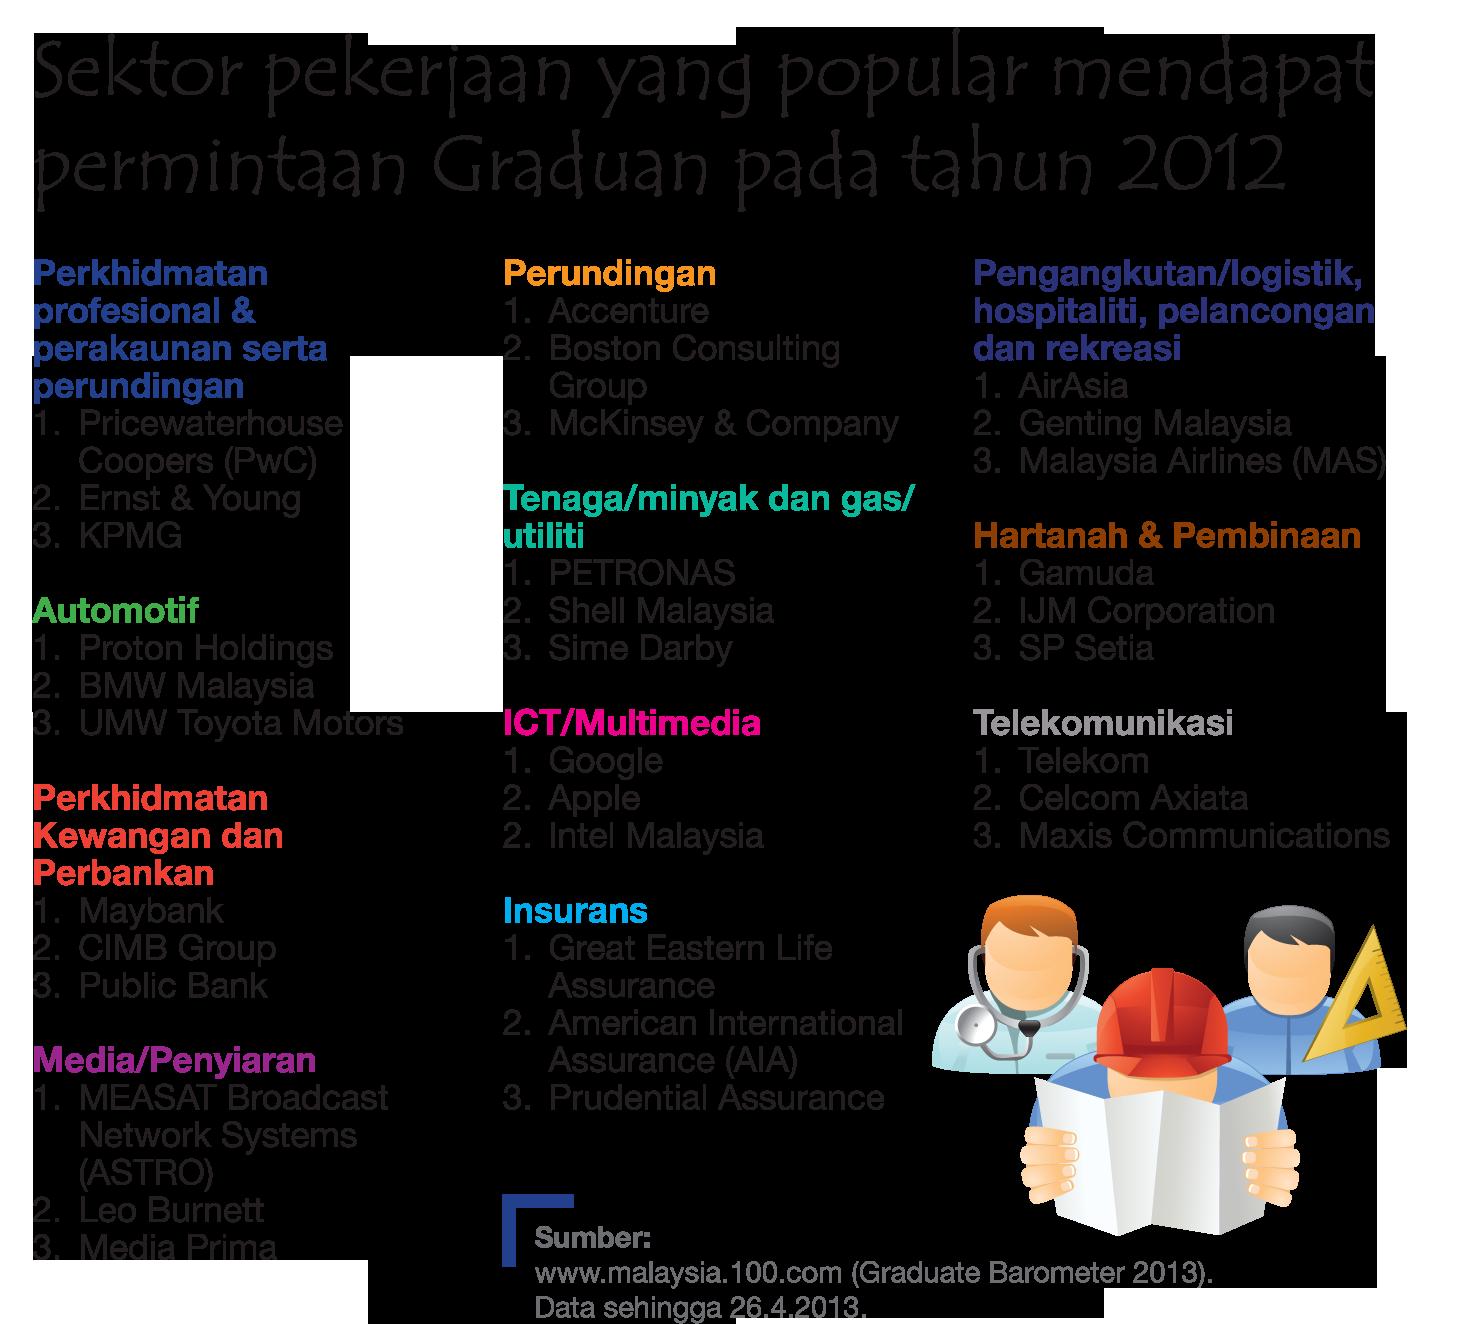 Institute For Youth Research Malaysia Sektor Pekerjaan Popular Di Kalangan Belia Malaysia